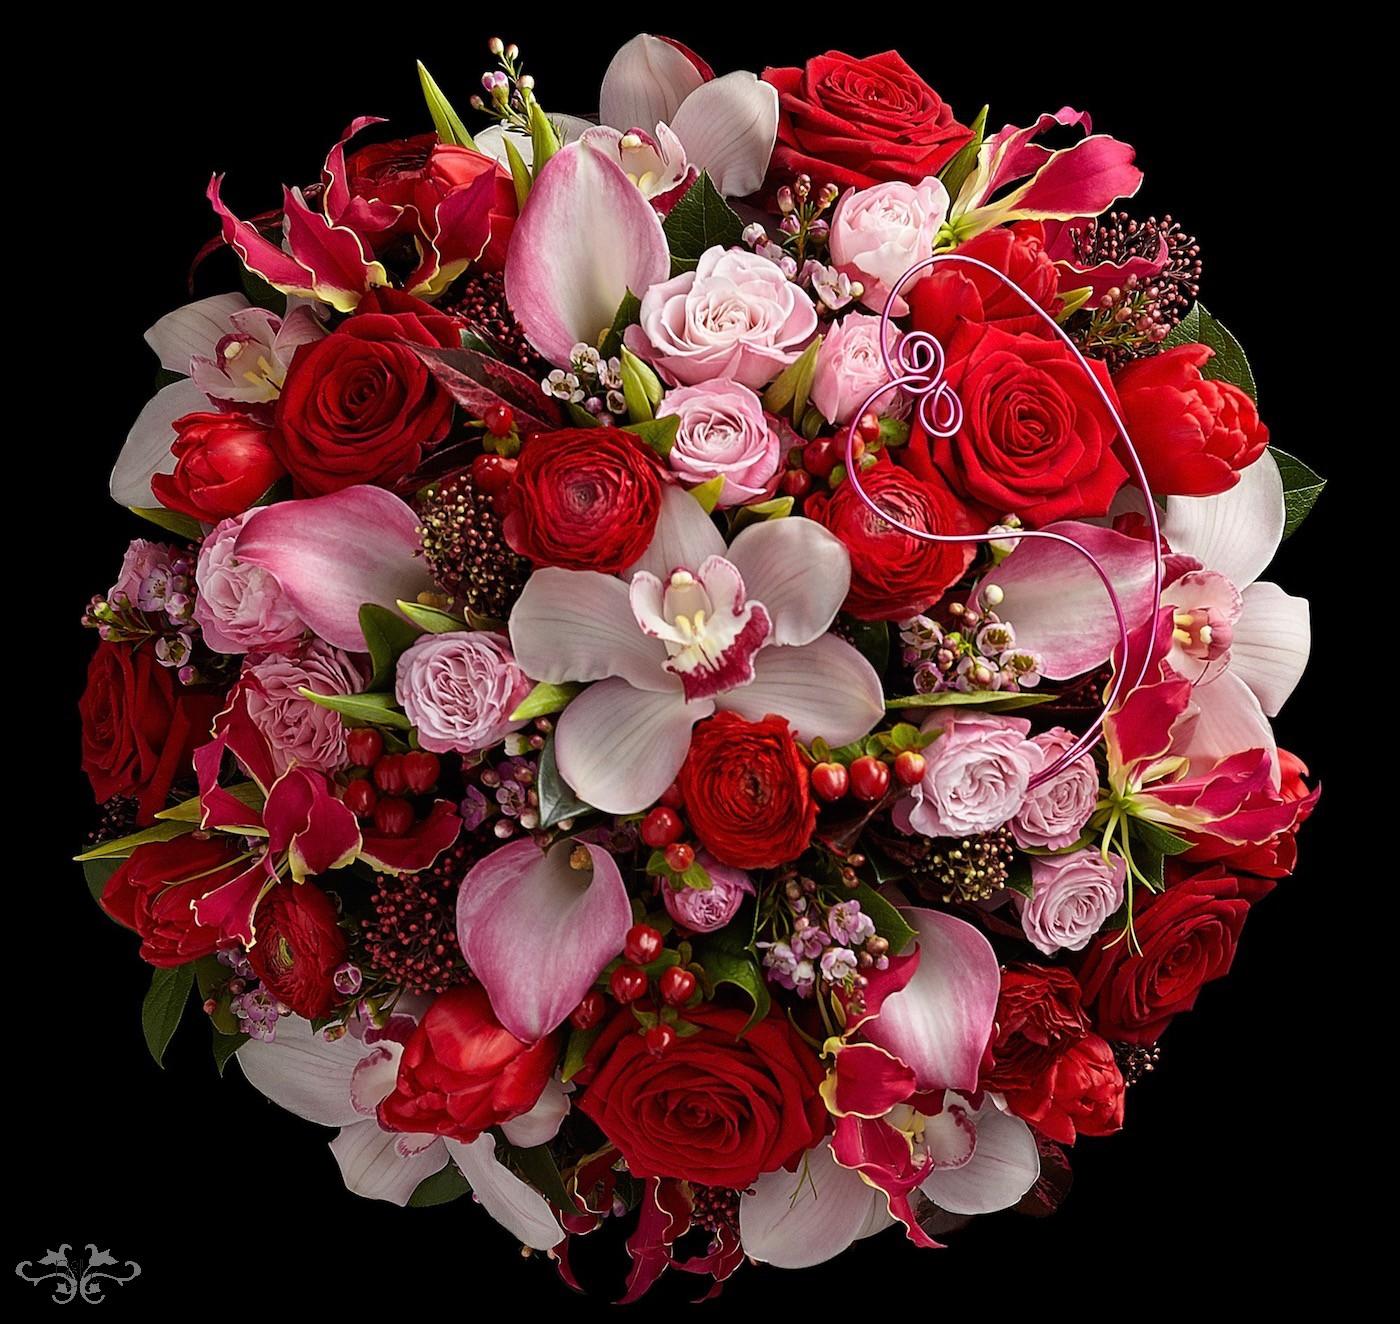 Haute Couture bouquet Neill Strain Valentine's Collection London